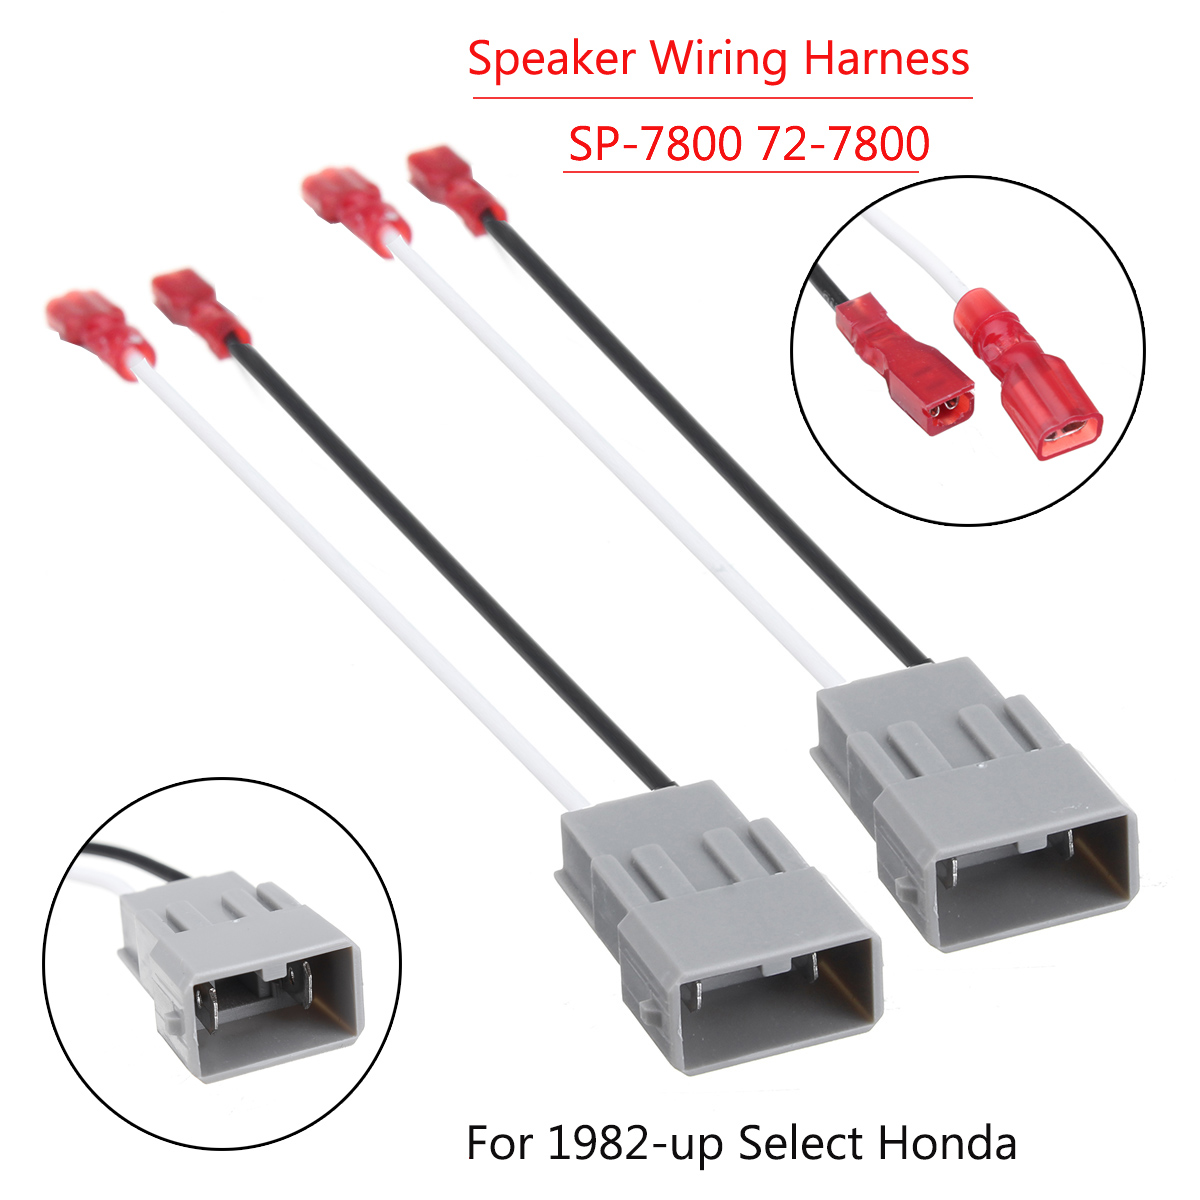 speaker wiring harness adapter one pair speaker wiring harness adapter sp 7800 72 7800 for honda  speaker wiring harness adapter sp 7800